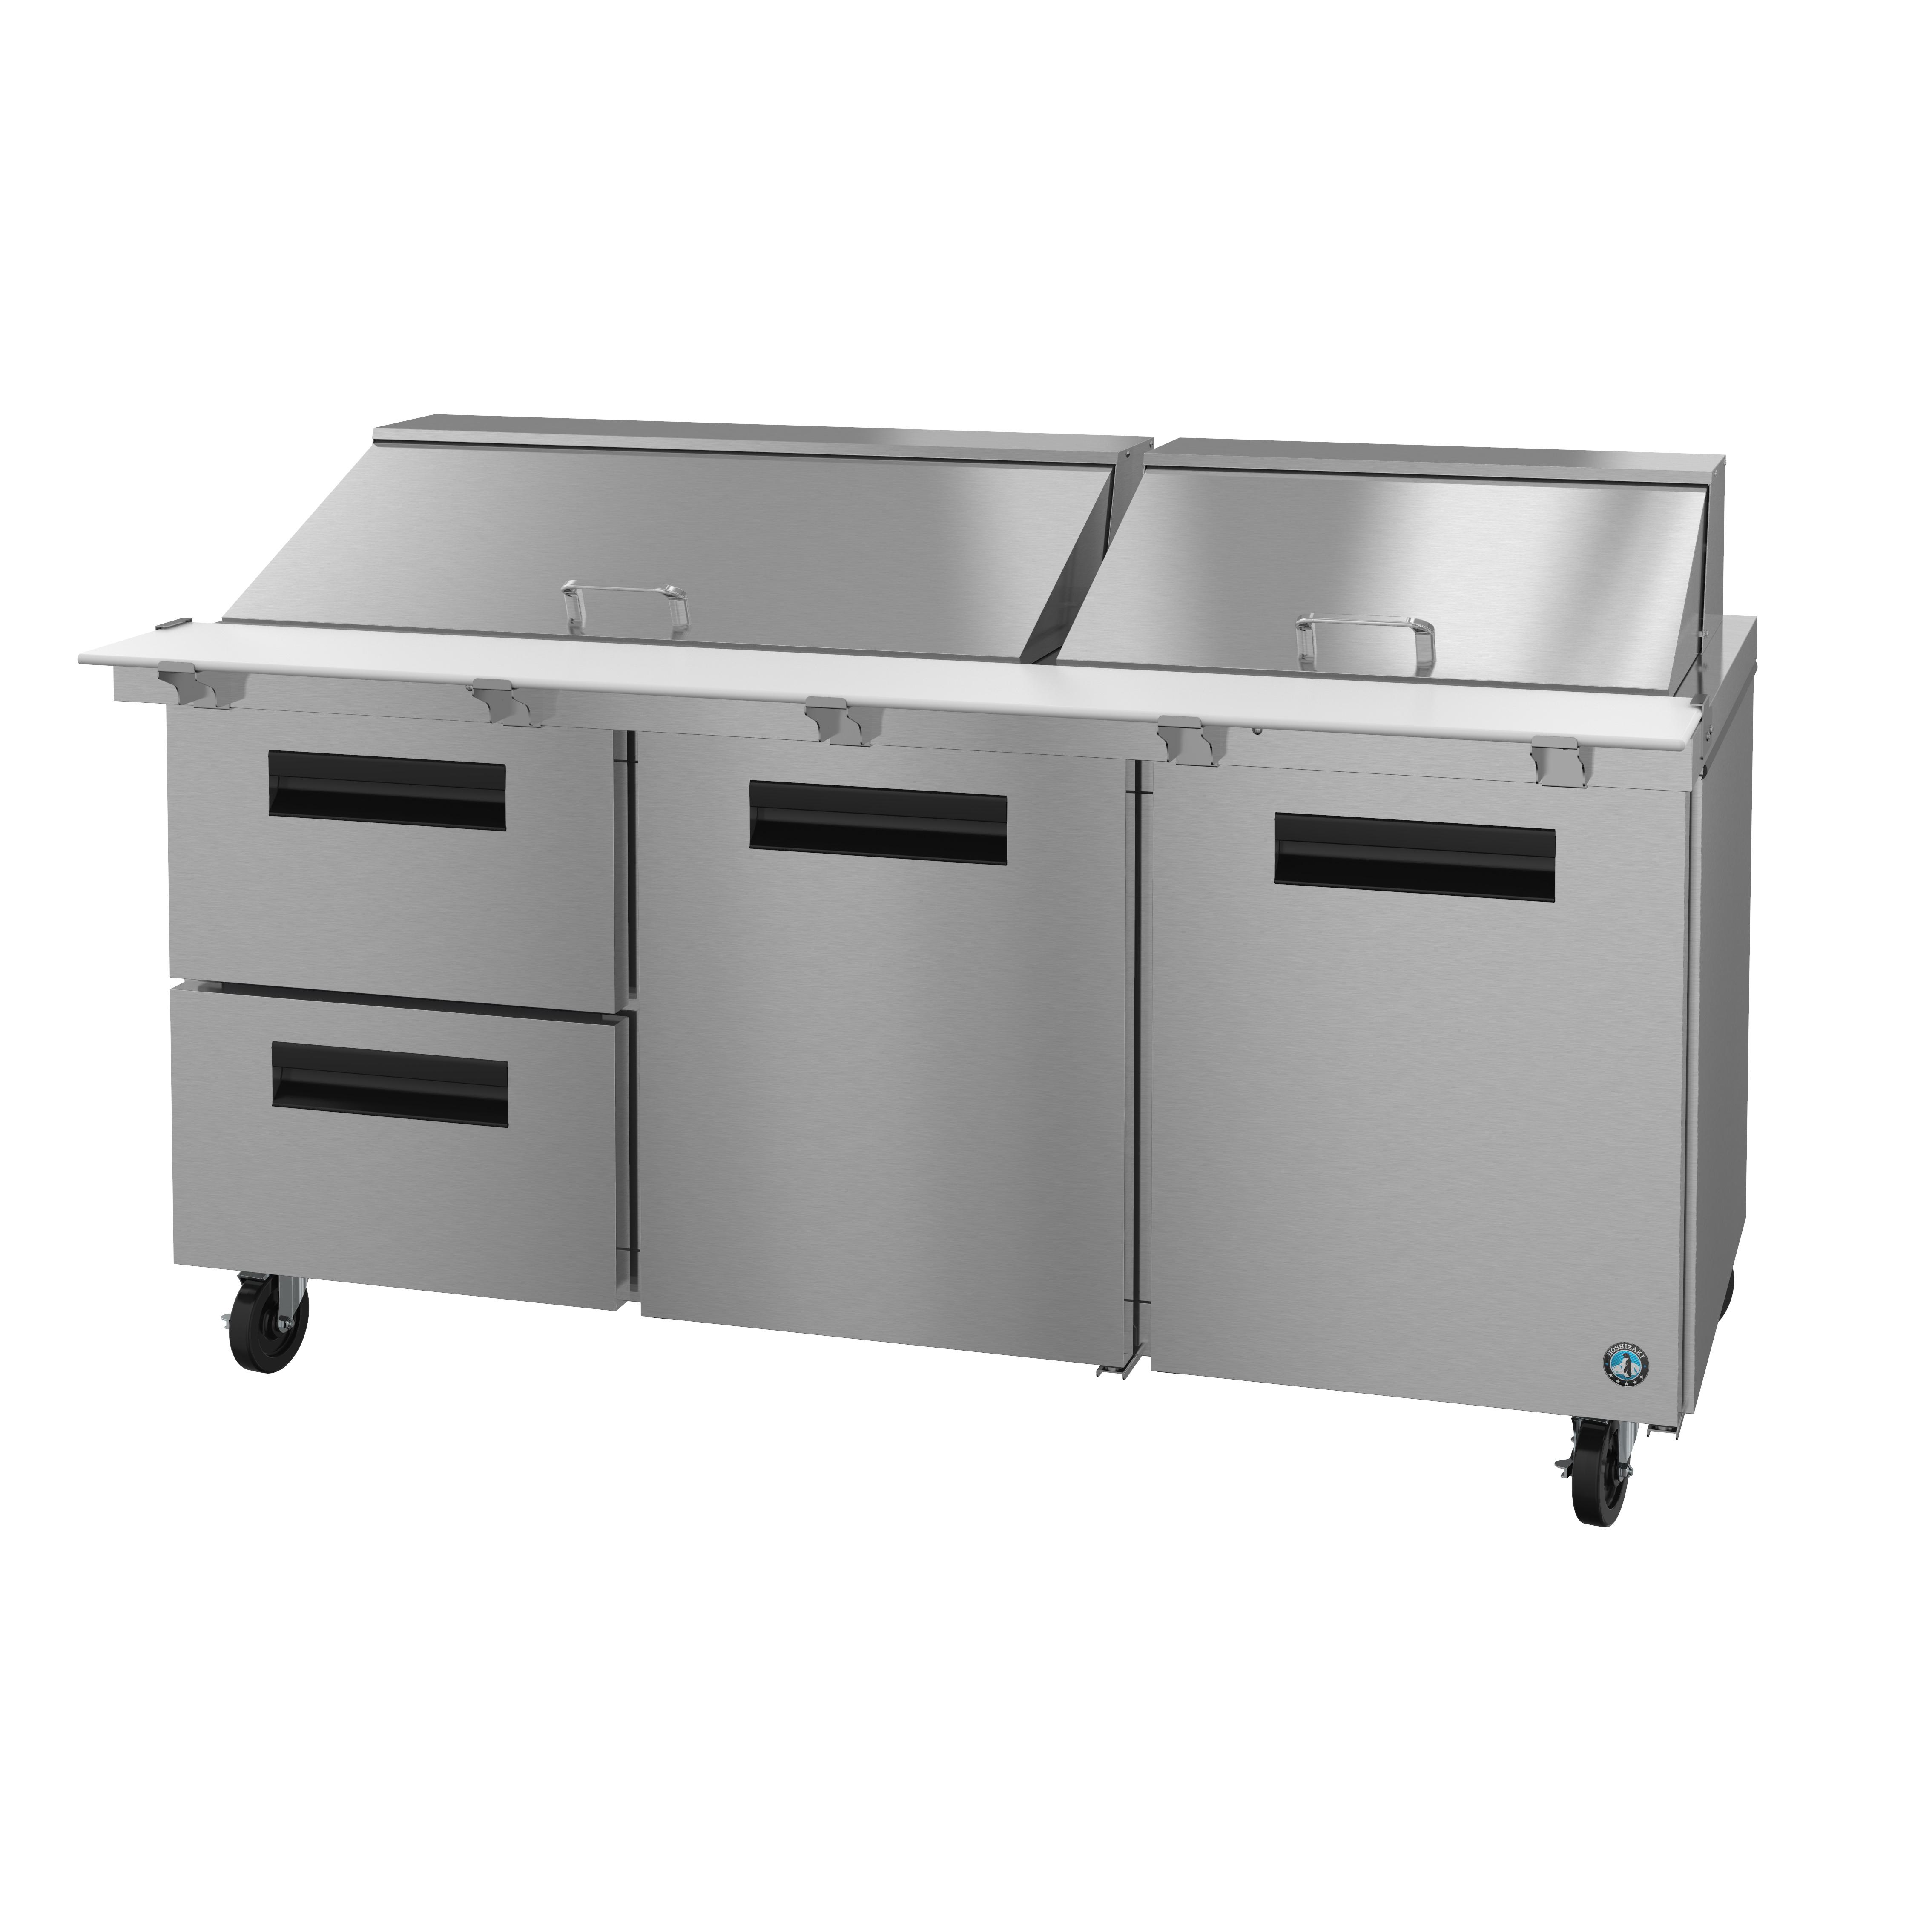 Hoshizaki SR72A-30MD2 refrigerated counter, mega top sandwich / salad unit